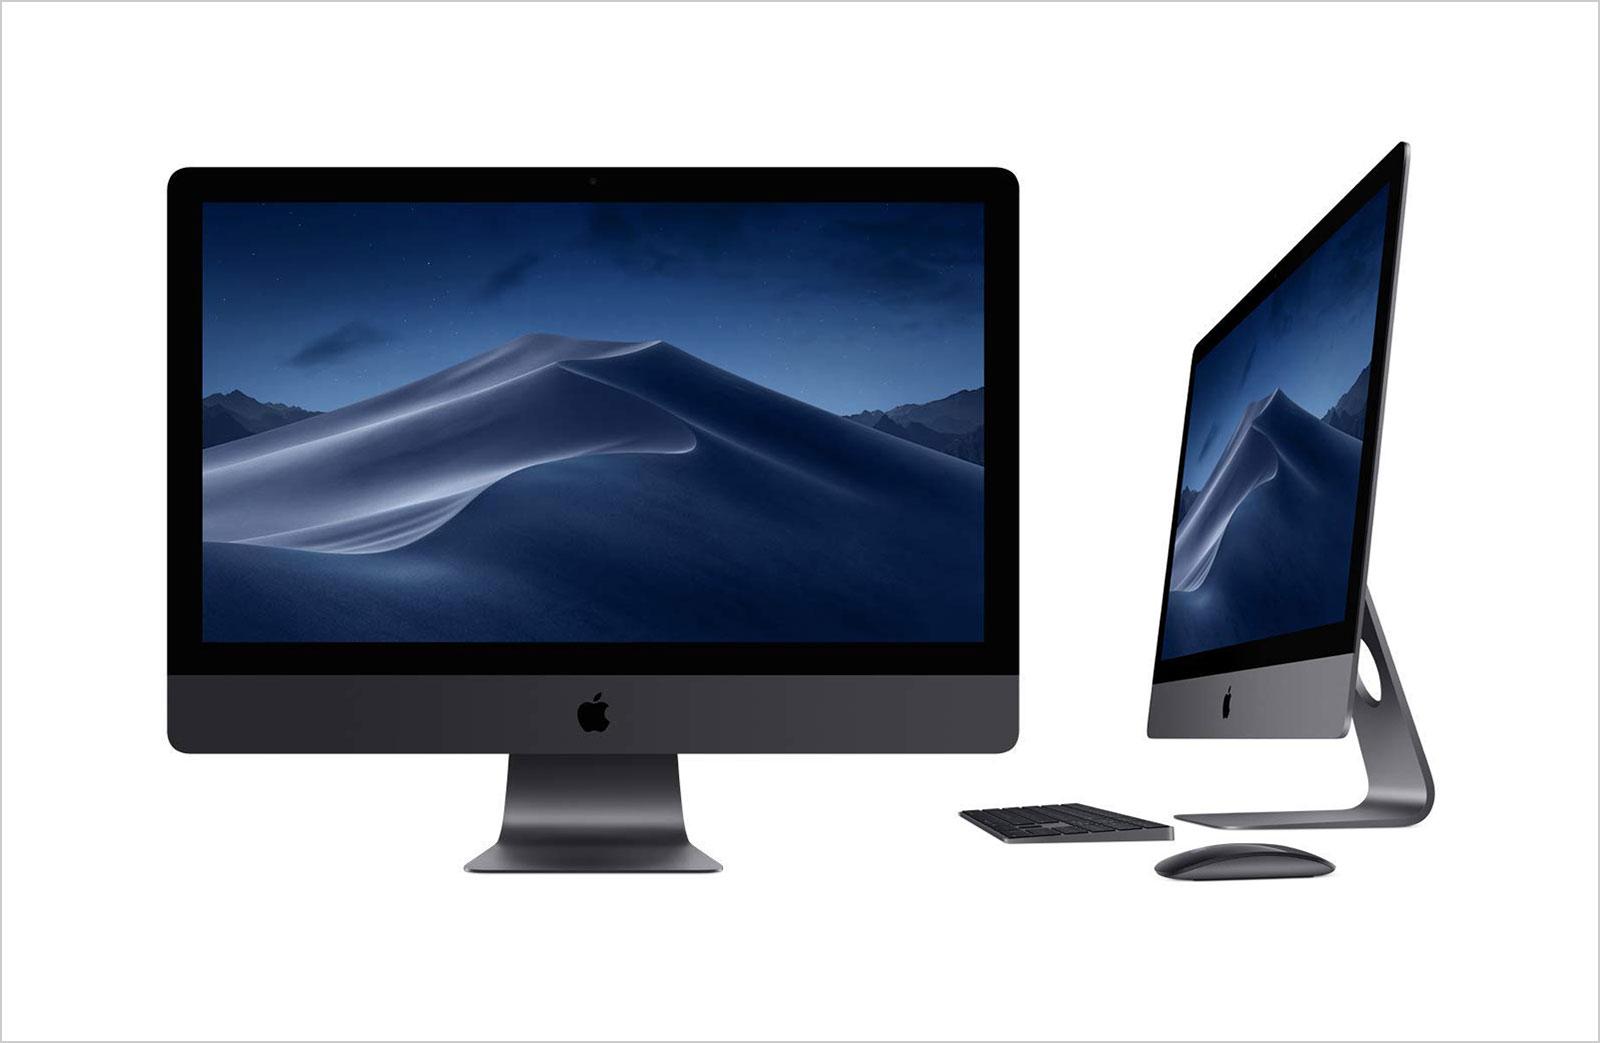 Apple-iMac-Pro-(27inches-with-Retina-5K-Display,-3